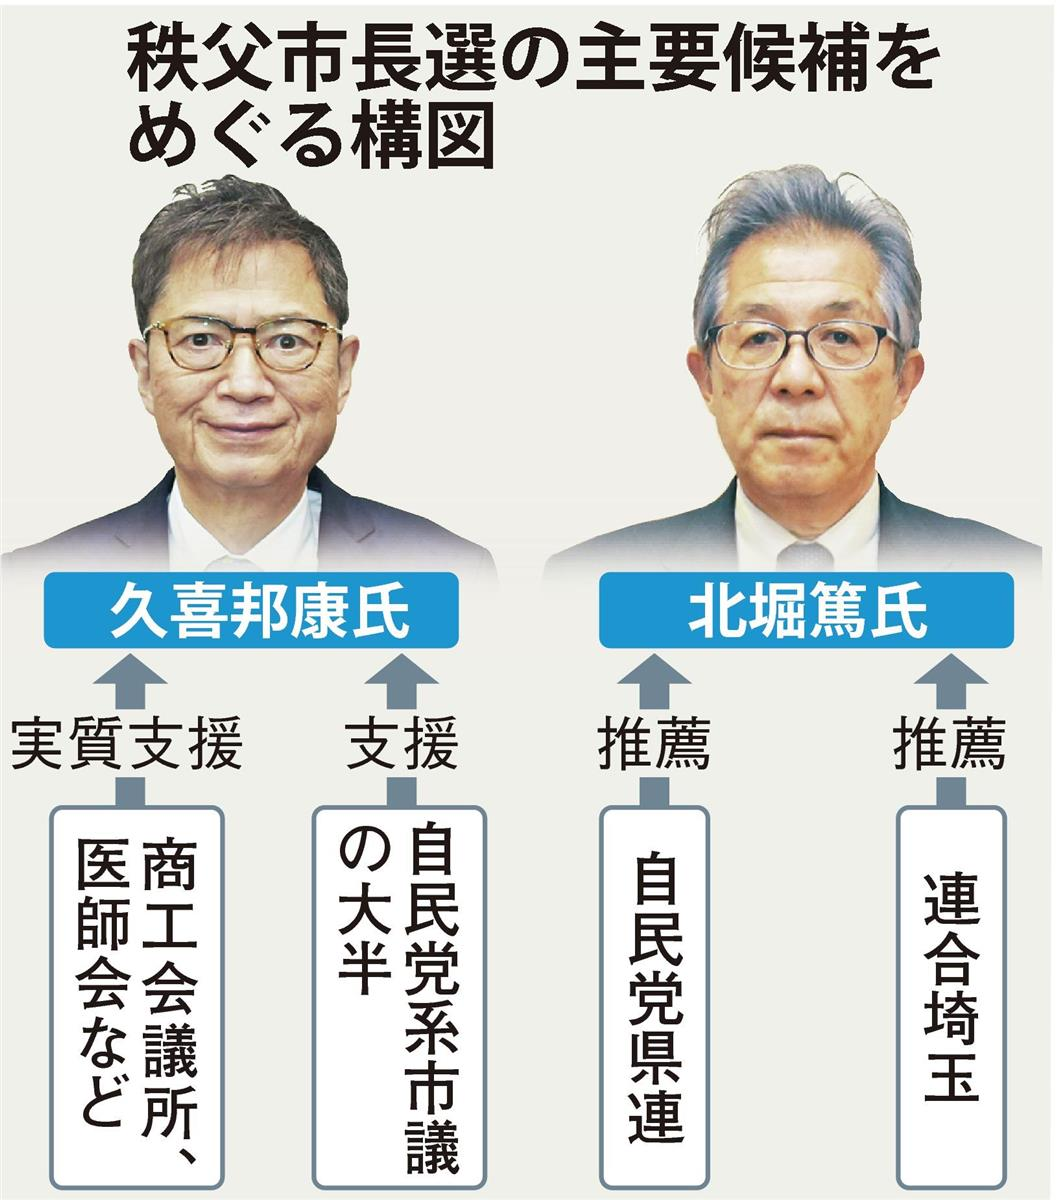 自民分裂…現職vs元県議、3度目の対決 埼玉・秩父市長選 - 産経ニュース